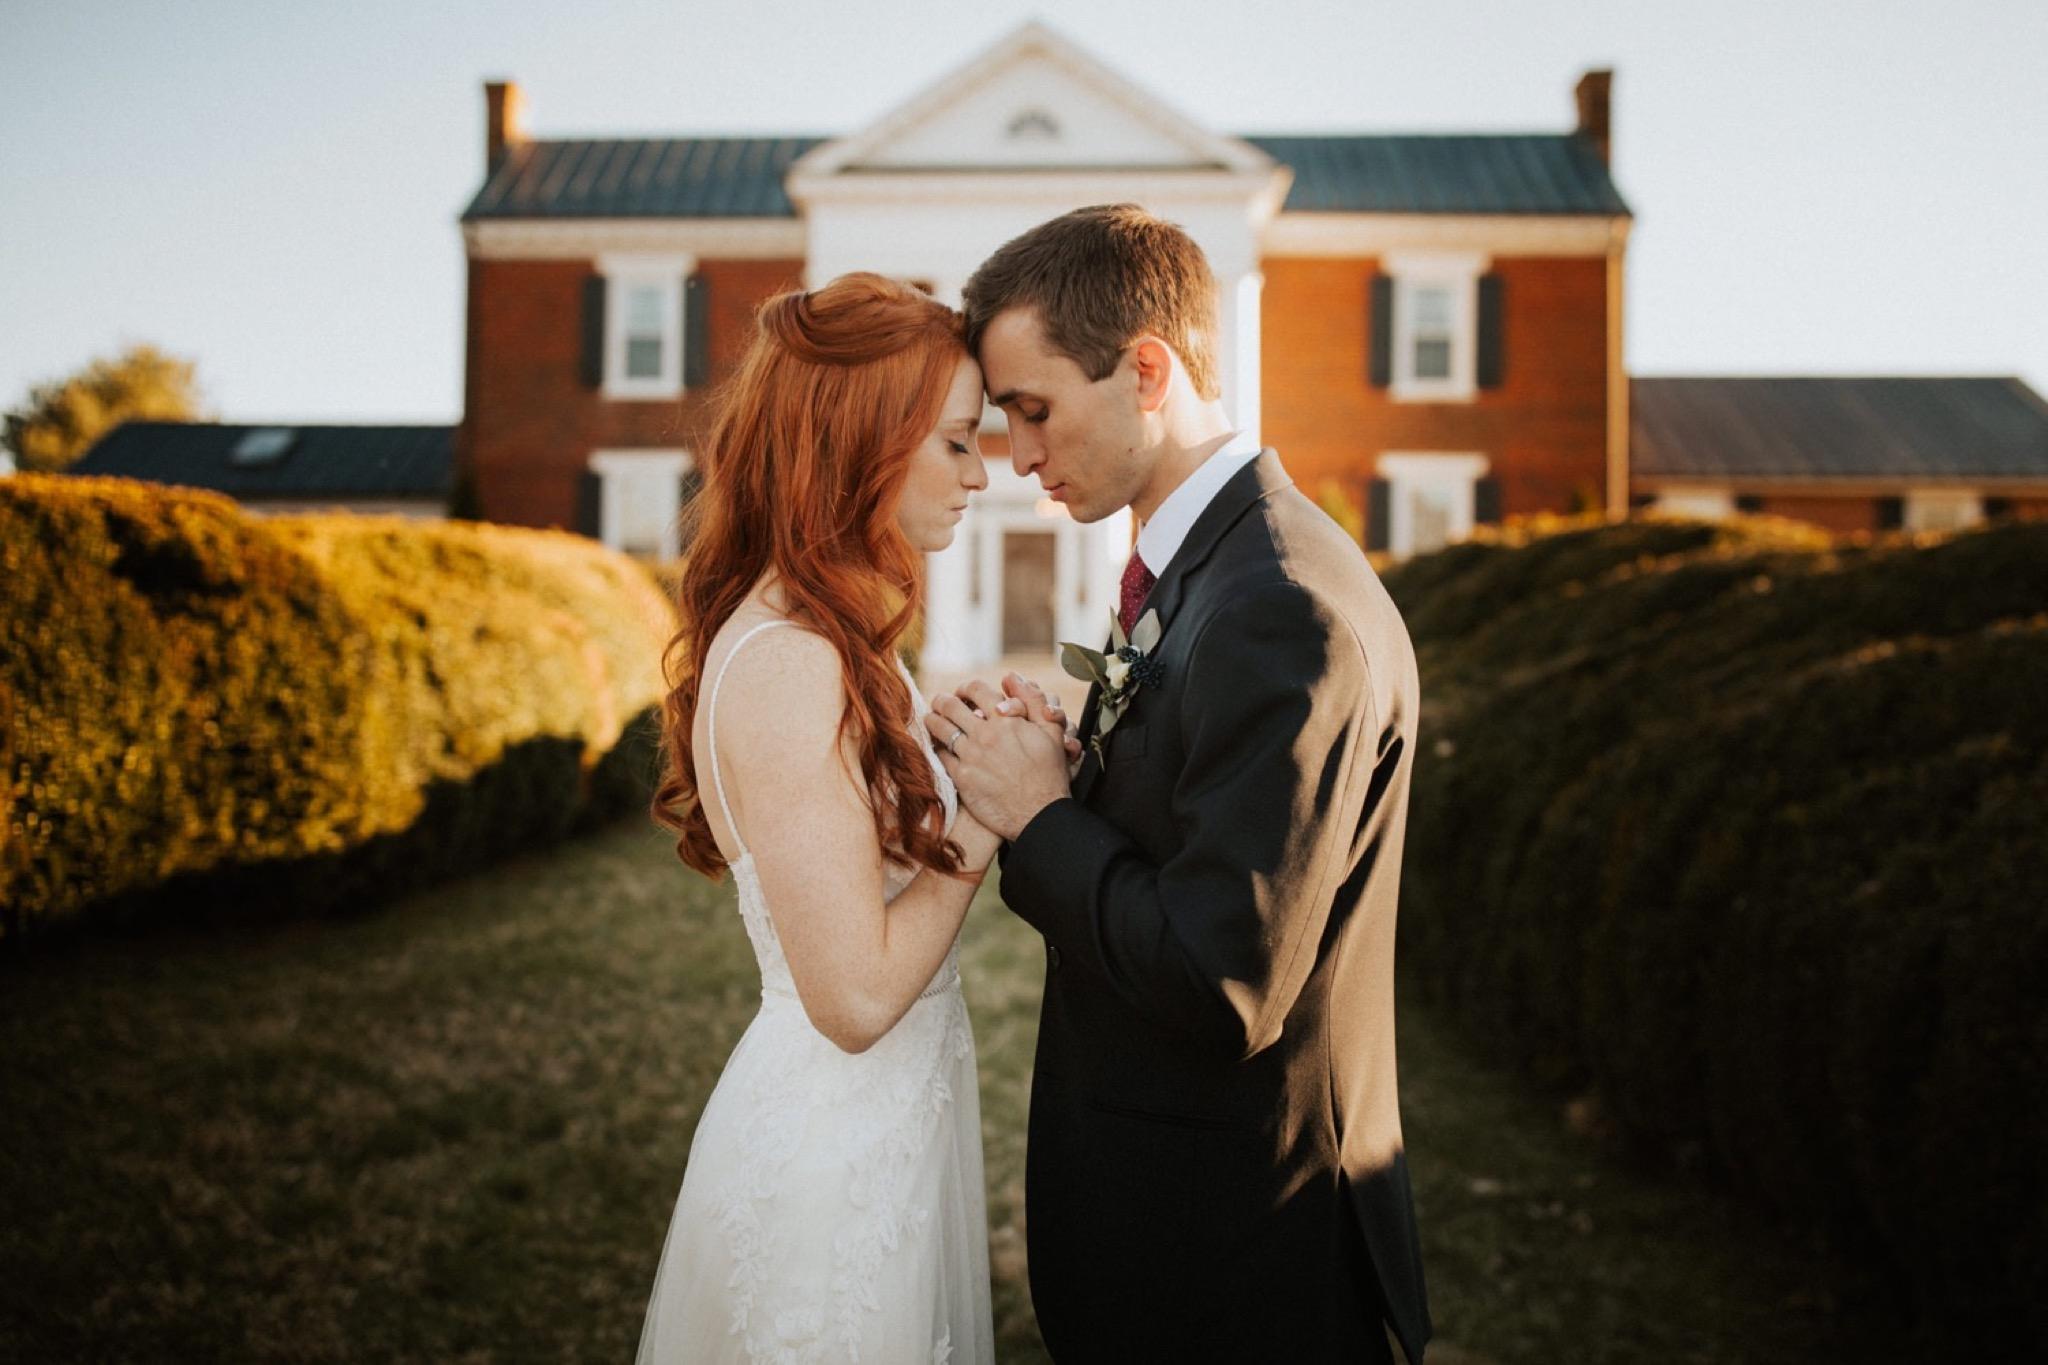 68_West Manor Estate Weddings - Pat Cori Photography-141_romantic_brideandgroom_WestManorEstate_Portraits_VirginiaWeddingPhotographer.jpg